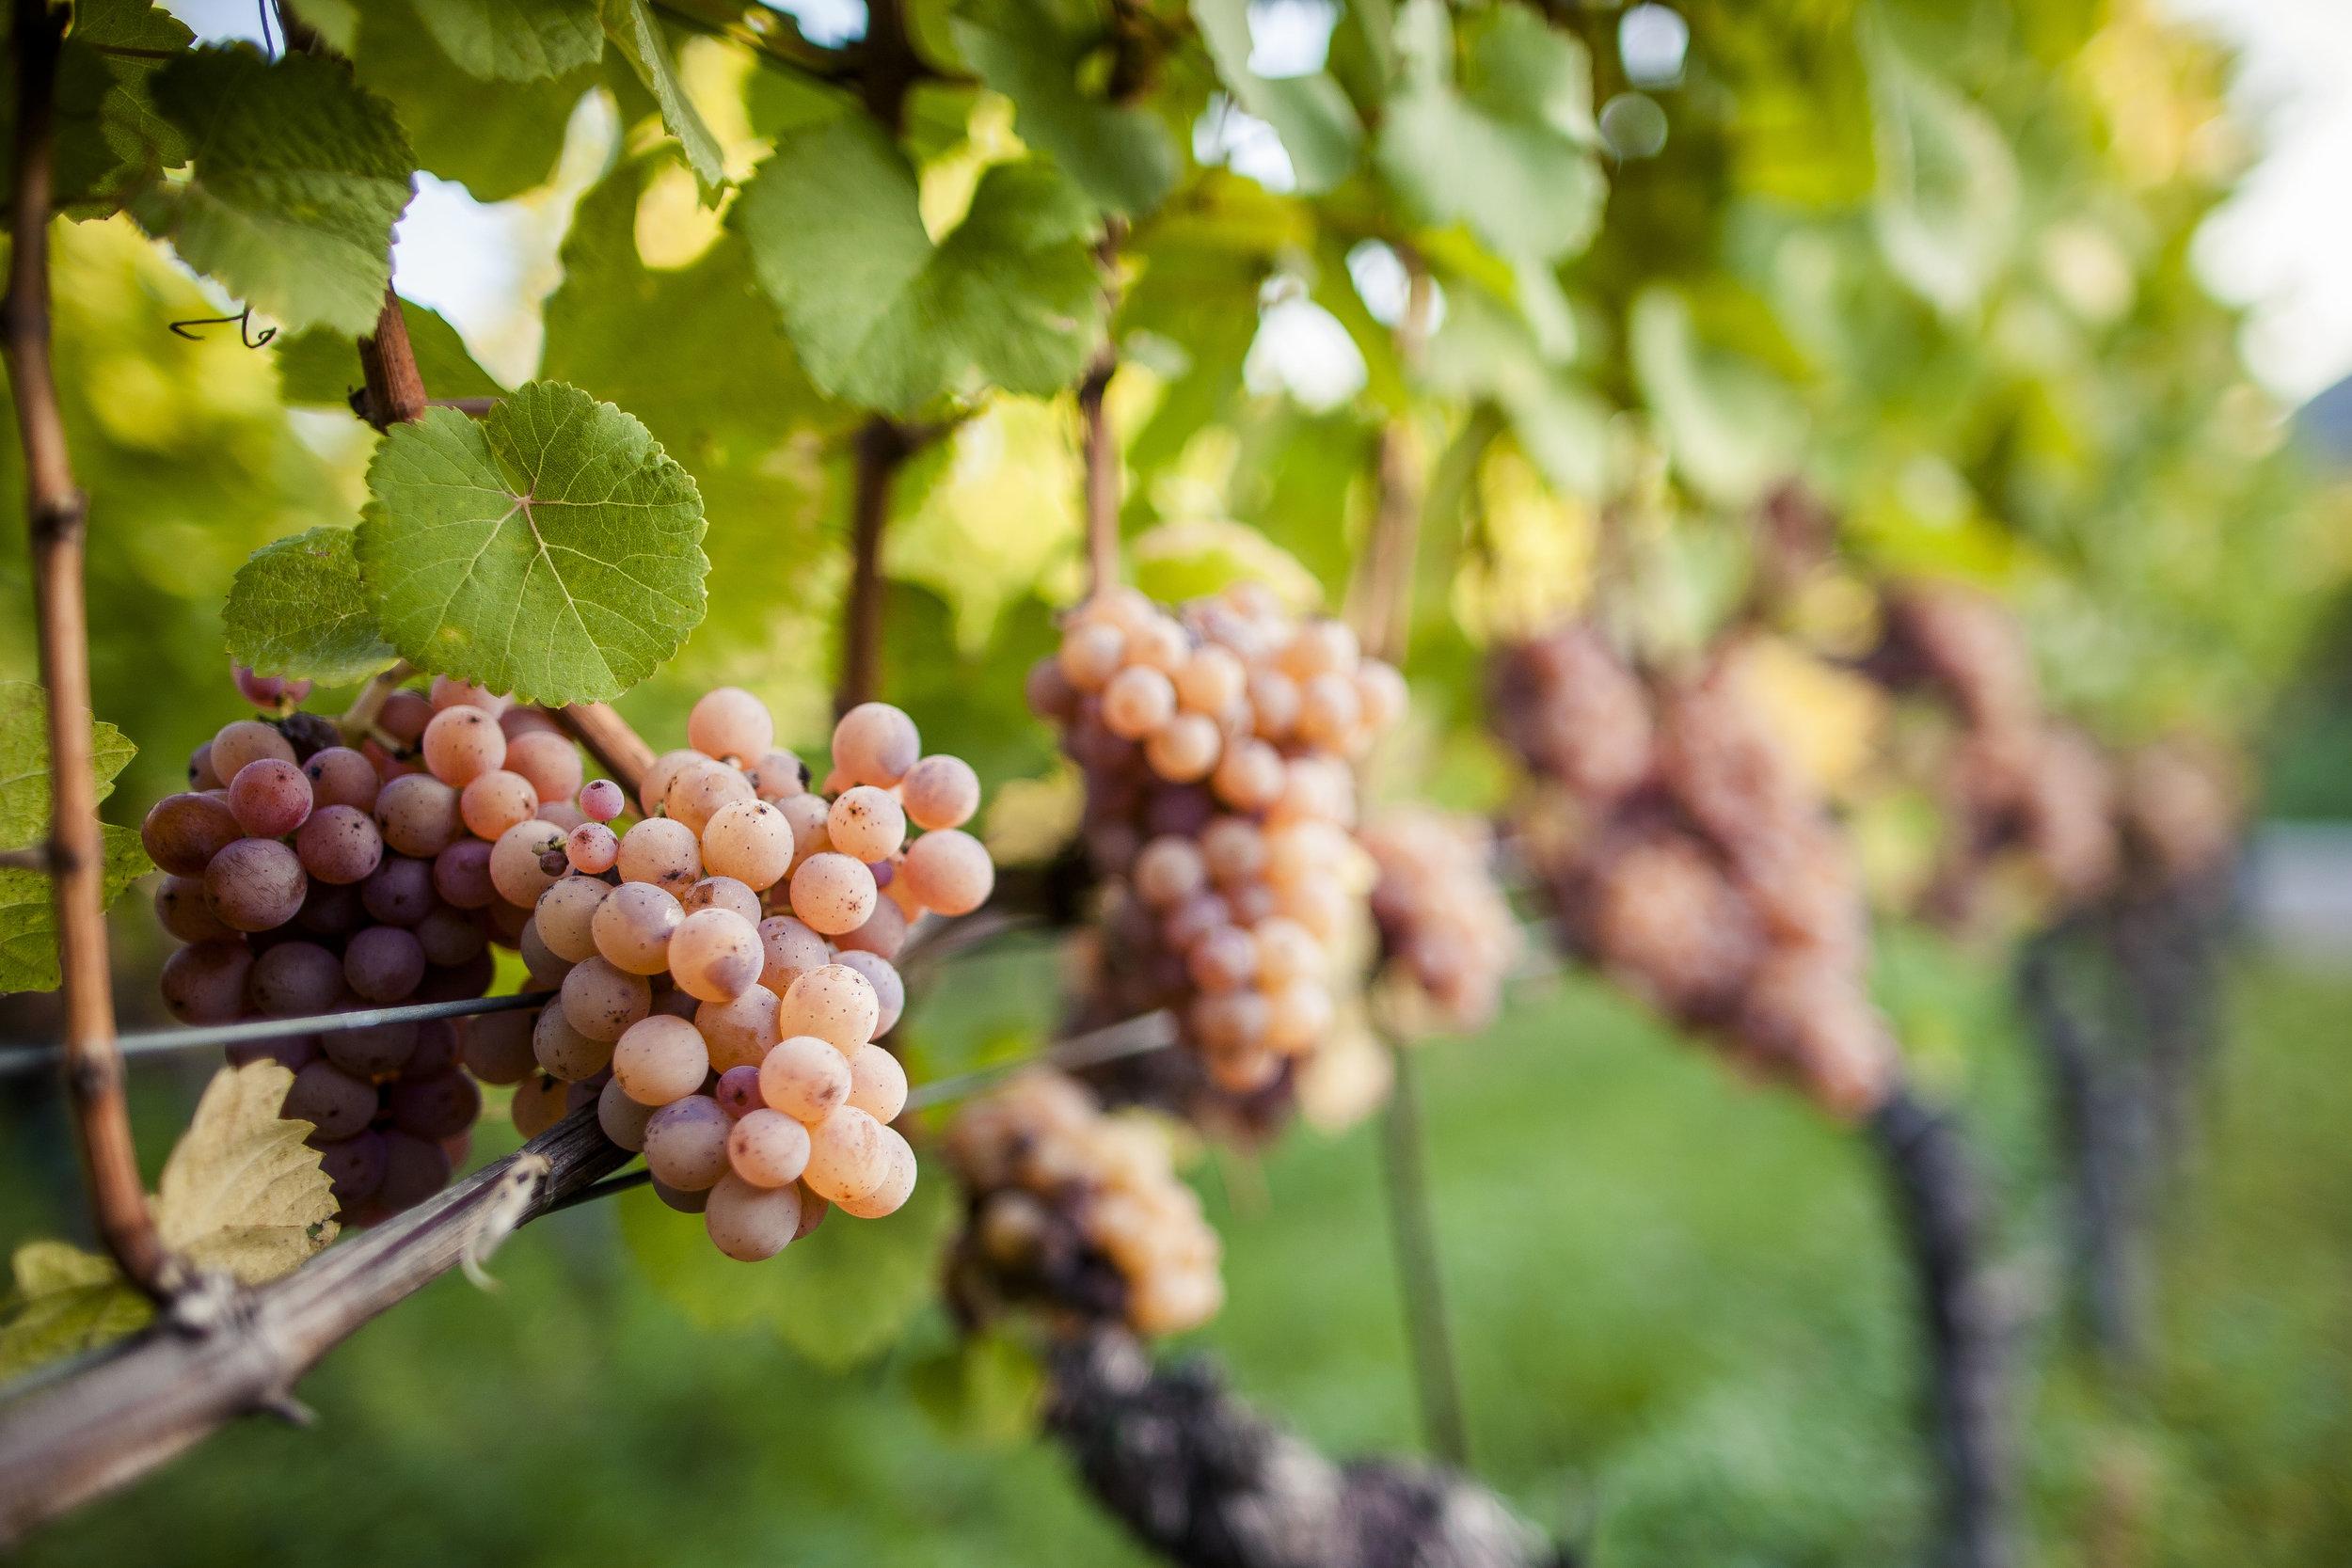 Gewürztraminer grapes growing in Suditrol, Alto Adige, photo by IDM - Florian Andergassen